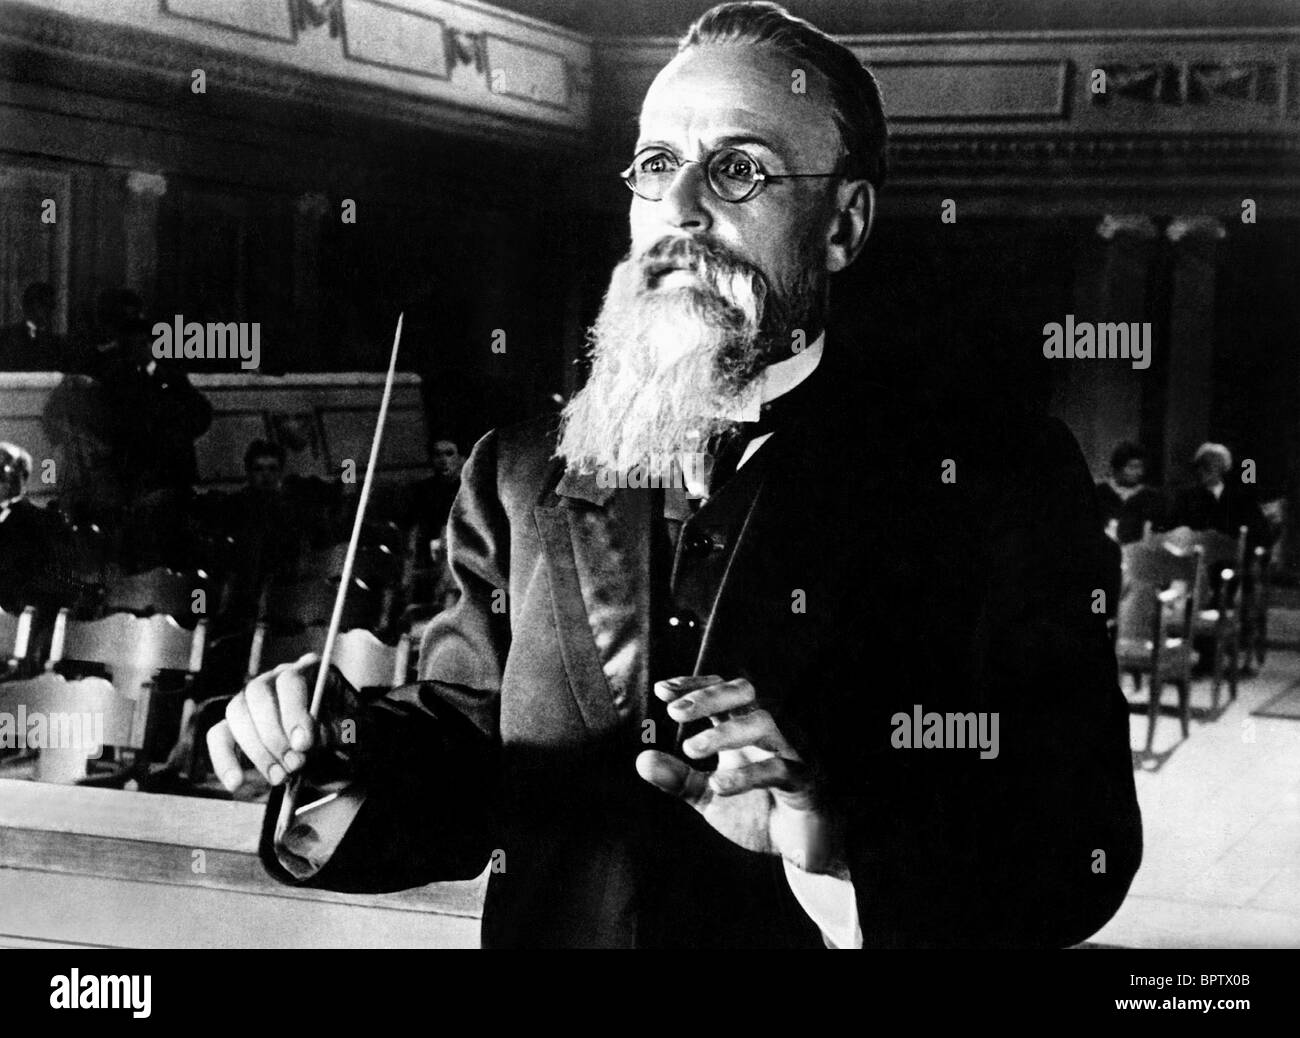 NIKOLAI RIMSKY-KORSAKOV MUSIC COMPOSER (1903) - Stock Image